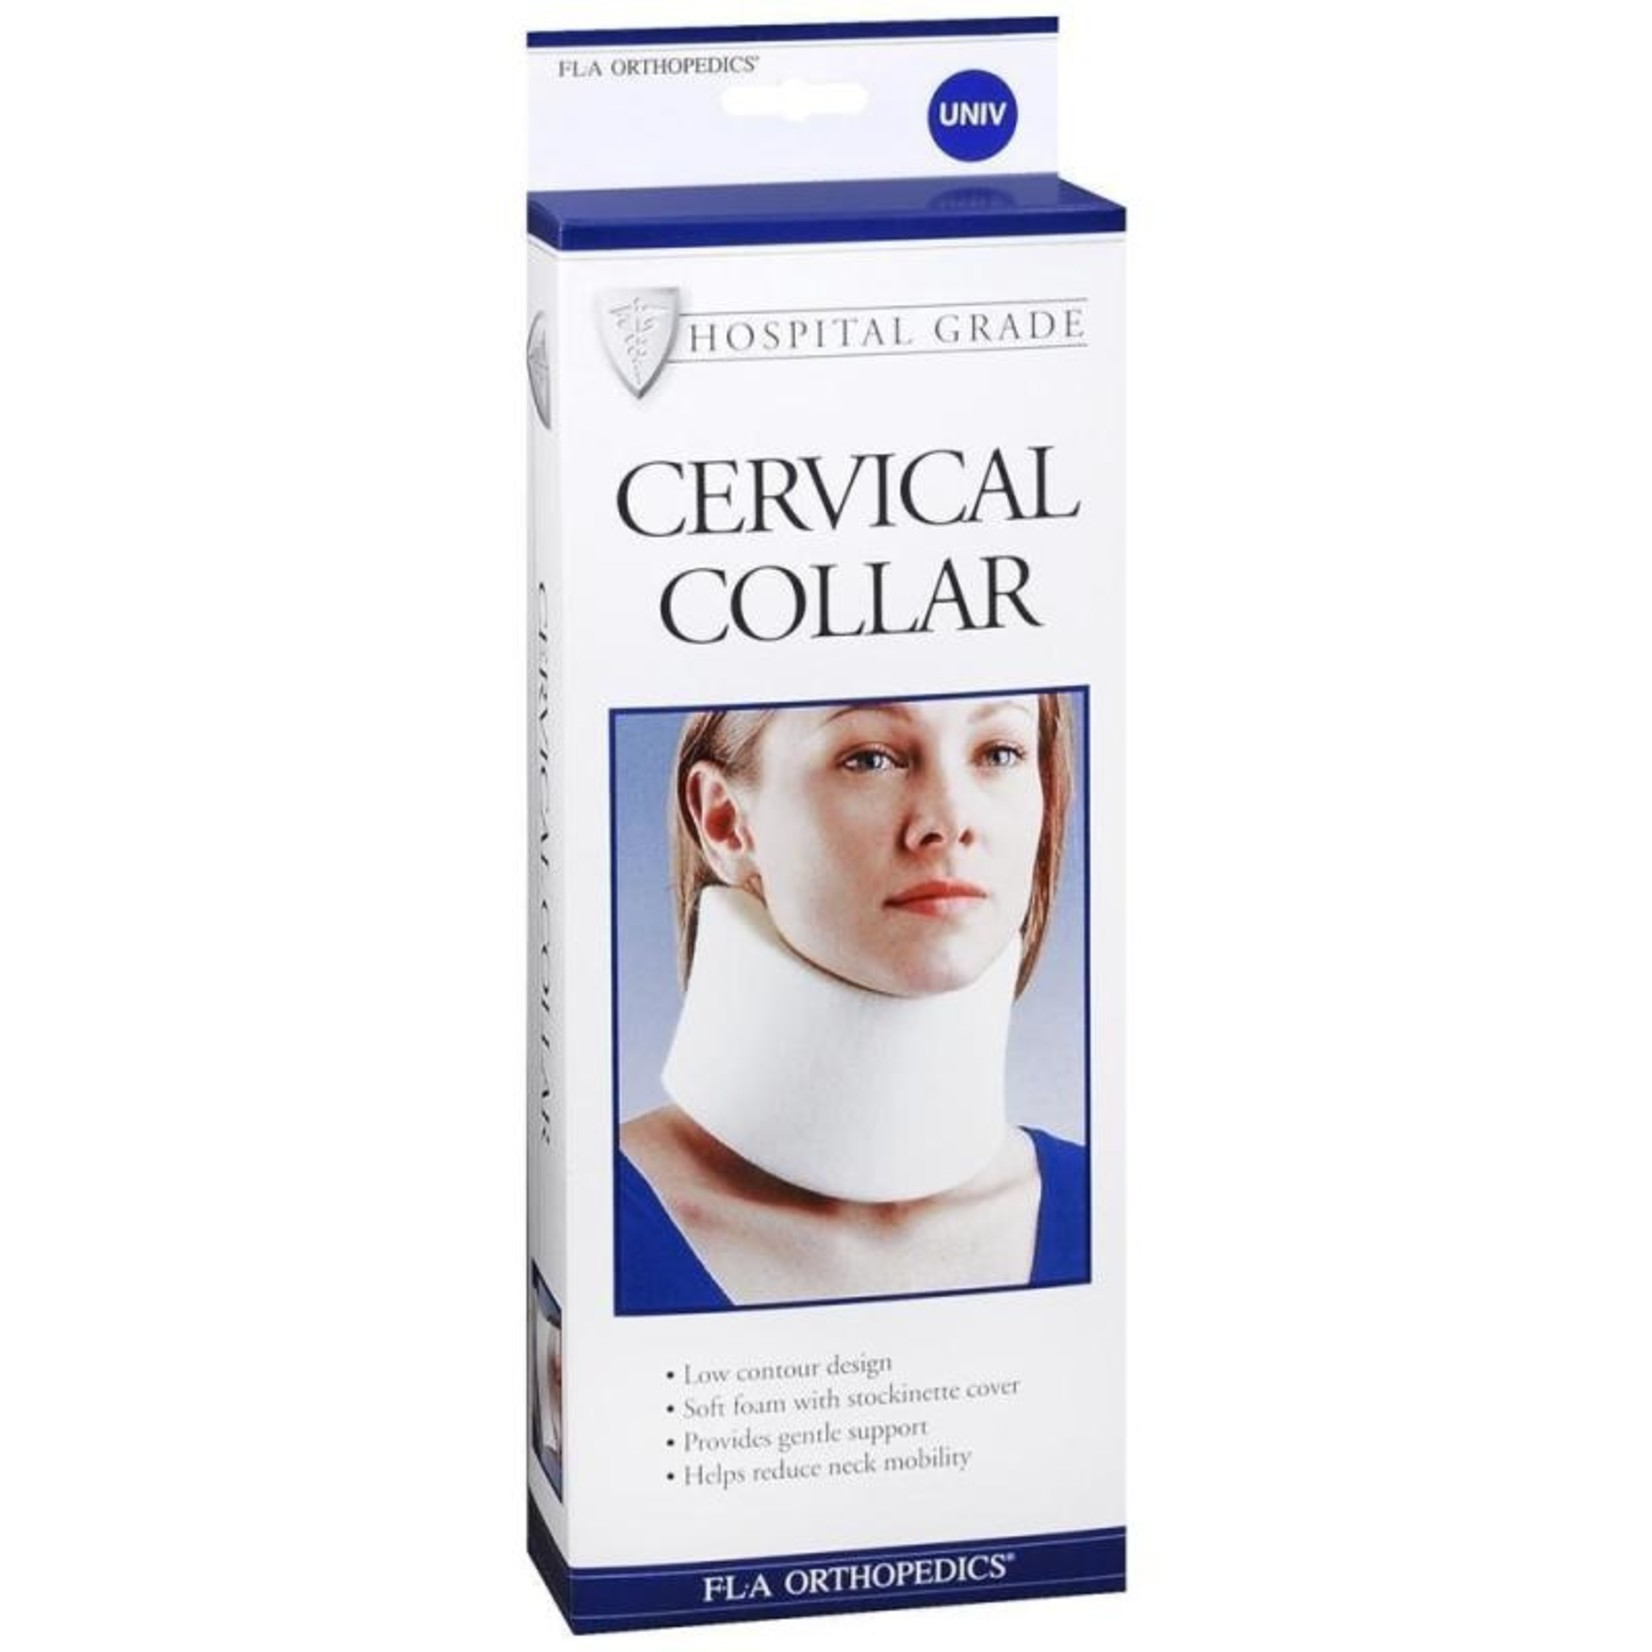 FLA Orthopedics CERVICAL COLLAR REG DENS NARROW WIDTH 2.5IN BEIGE